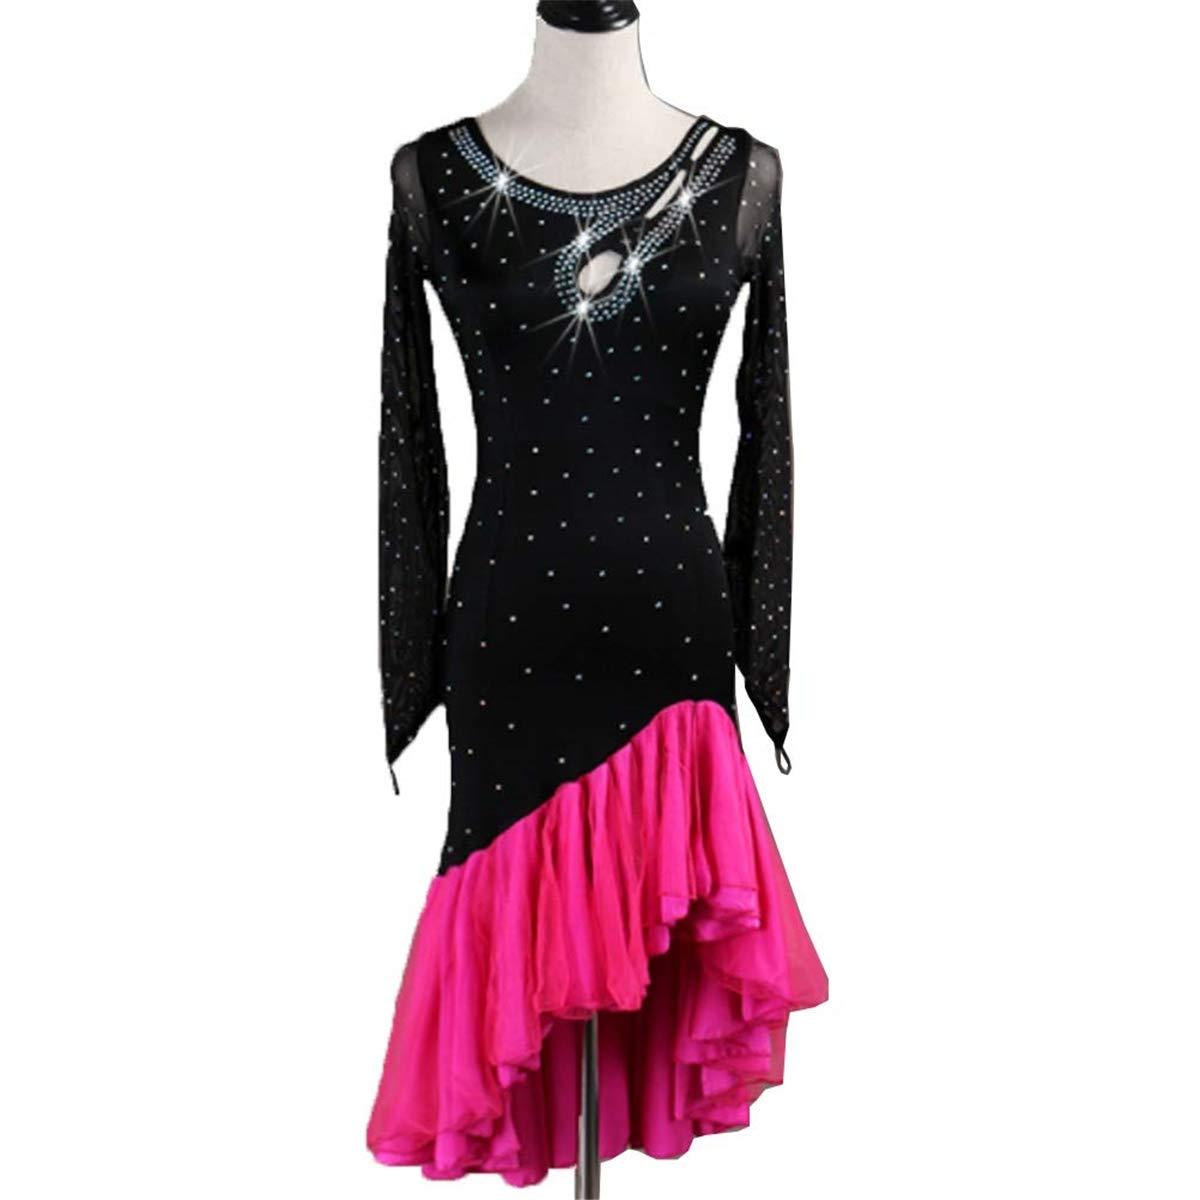 Pink L H&Q Women's Long Sleeve Samba Latin Dance Dress Performance Costume, Adult Latin Rumba Ballroom Dress with Rhinestones